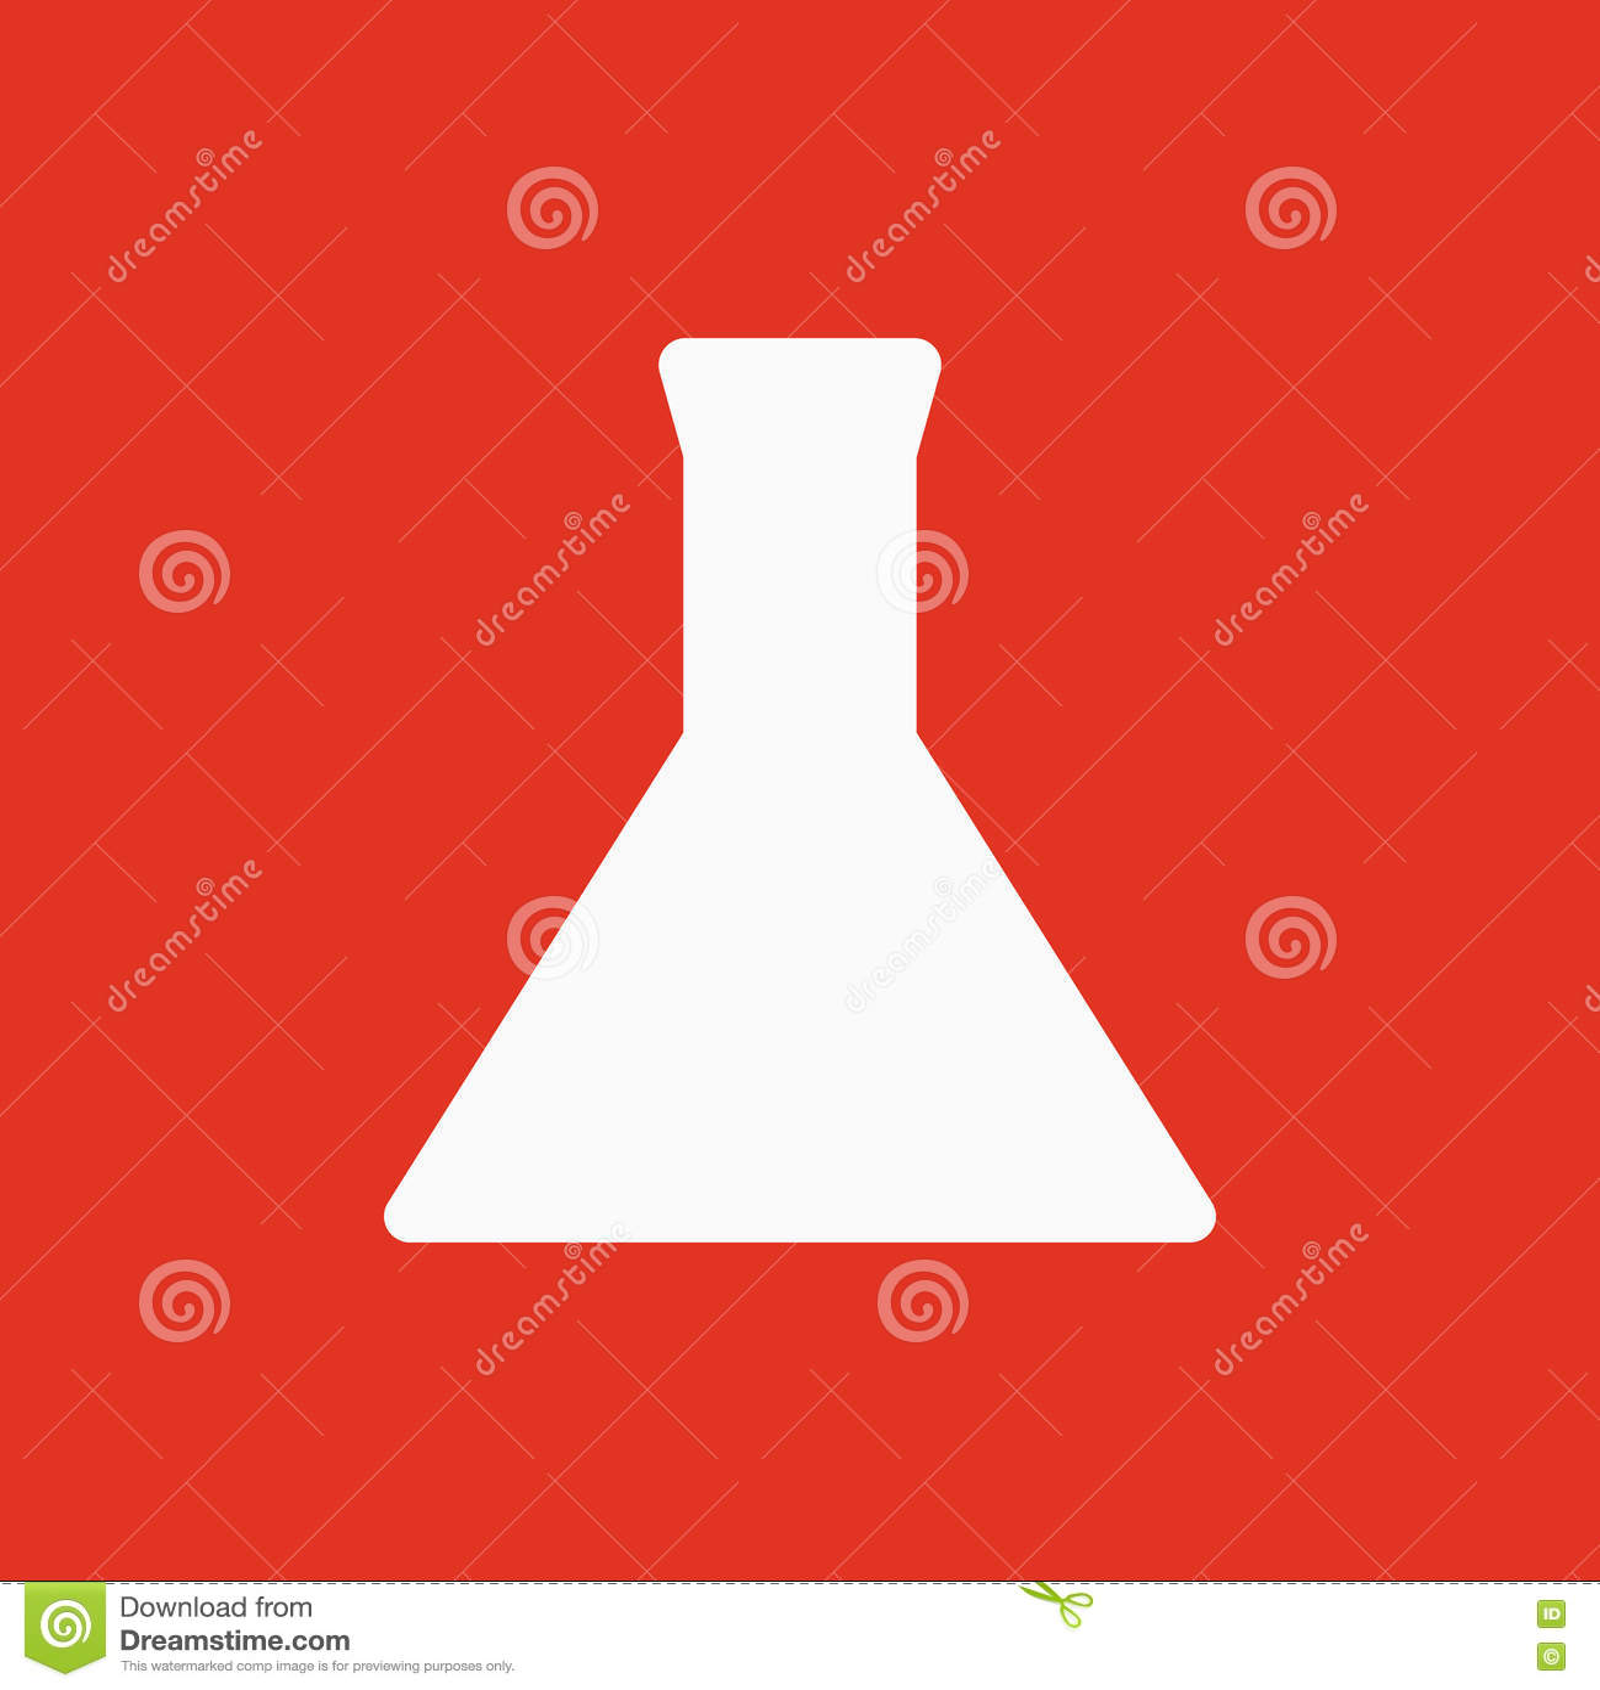 Provrörsymbolen Flaska och kemikalie, analys, kemi, laboratoriumsymbol plant